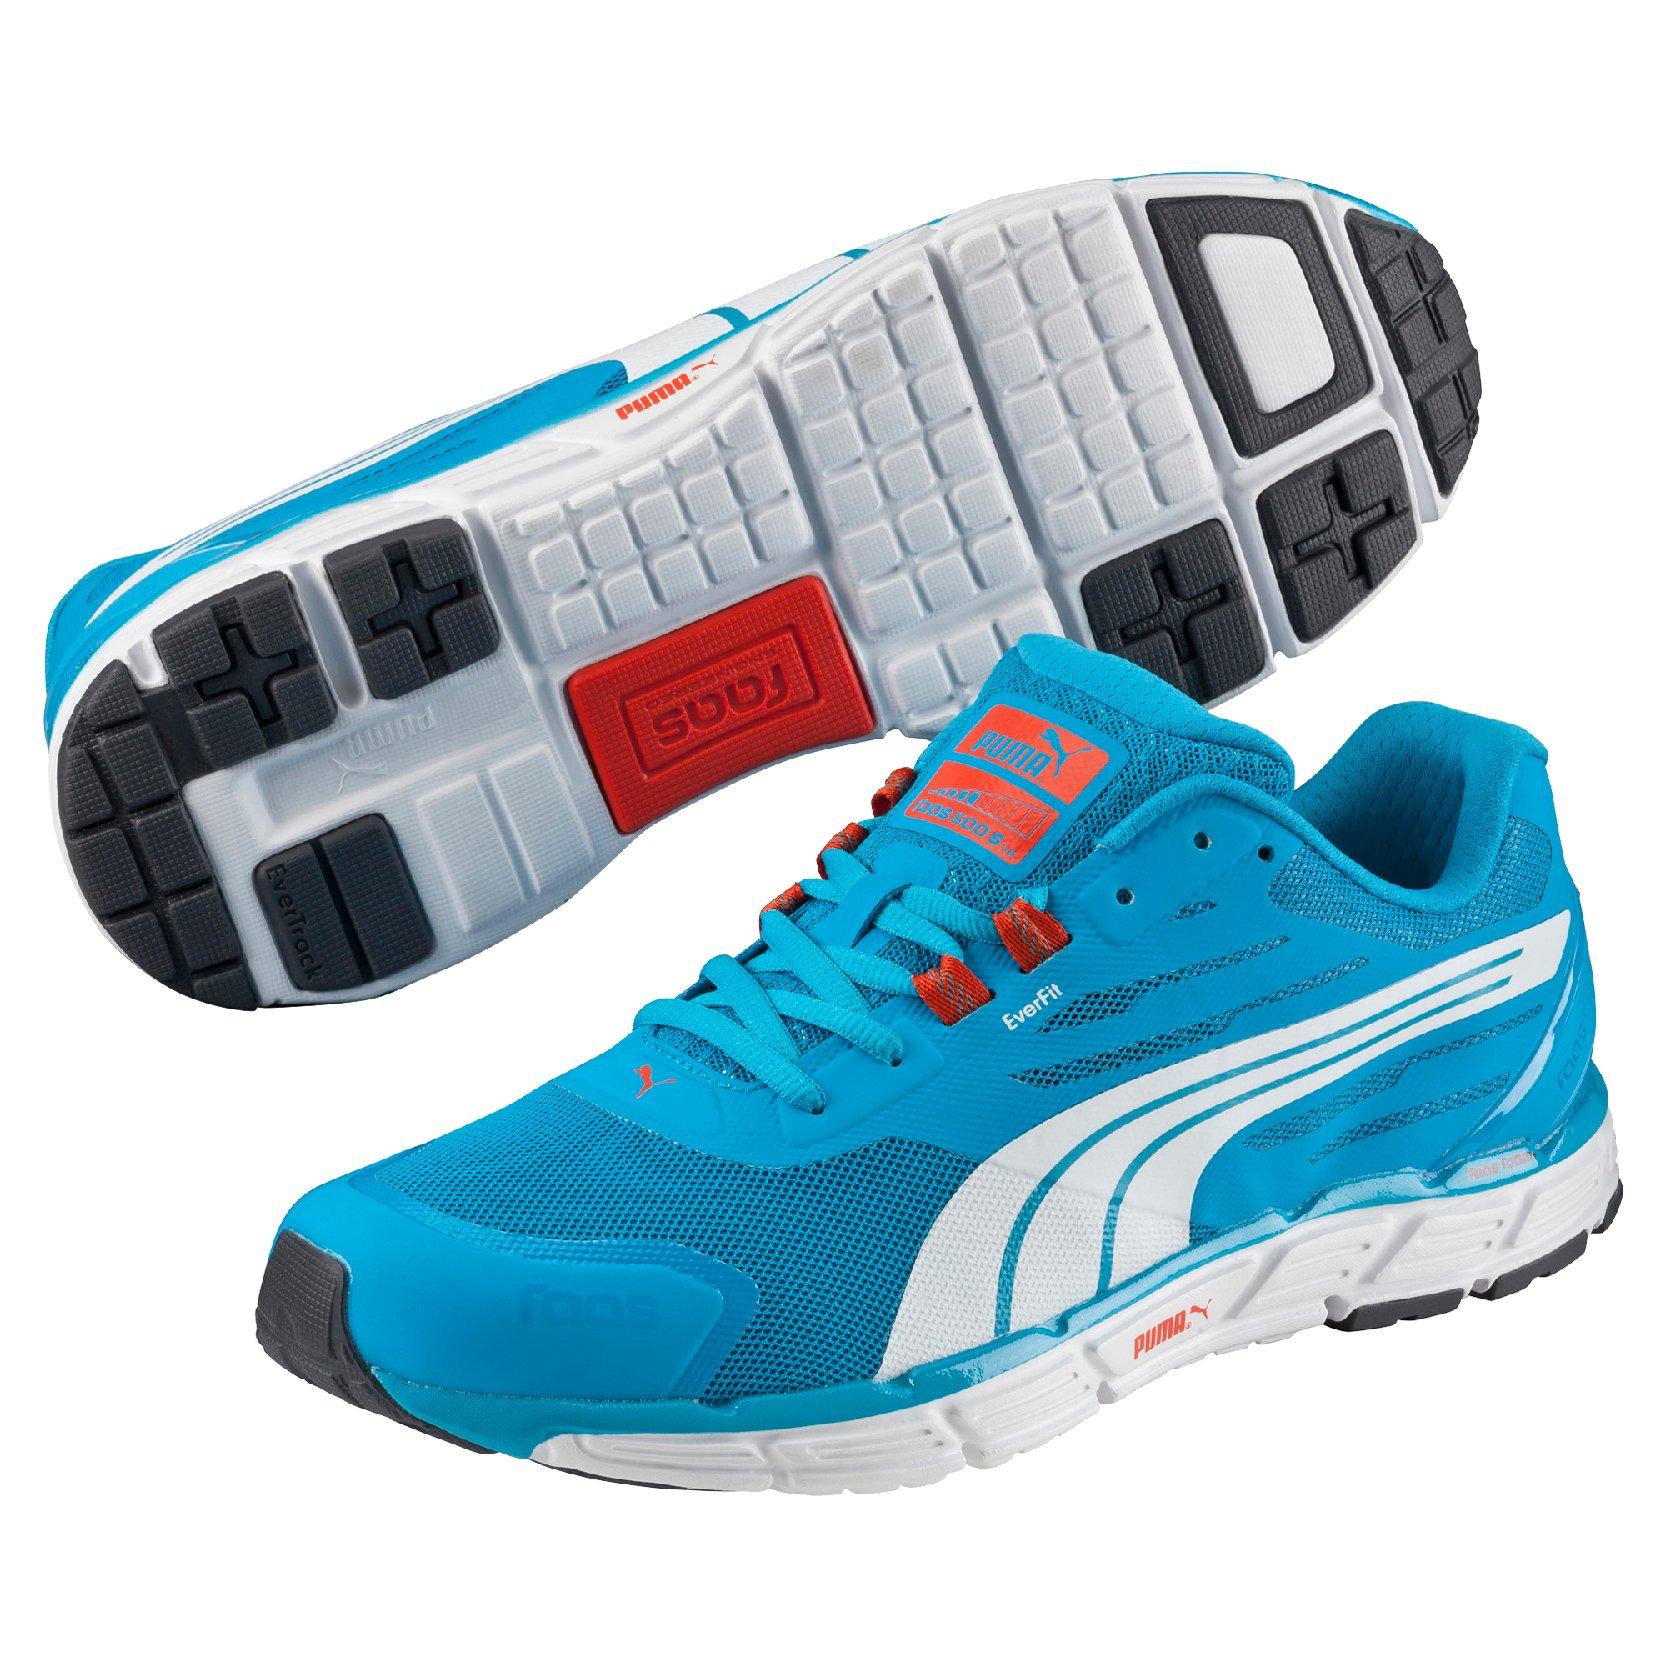 4faa2804805 Běžecké boty Puma Faas 500 S v2 atomic blue-white